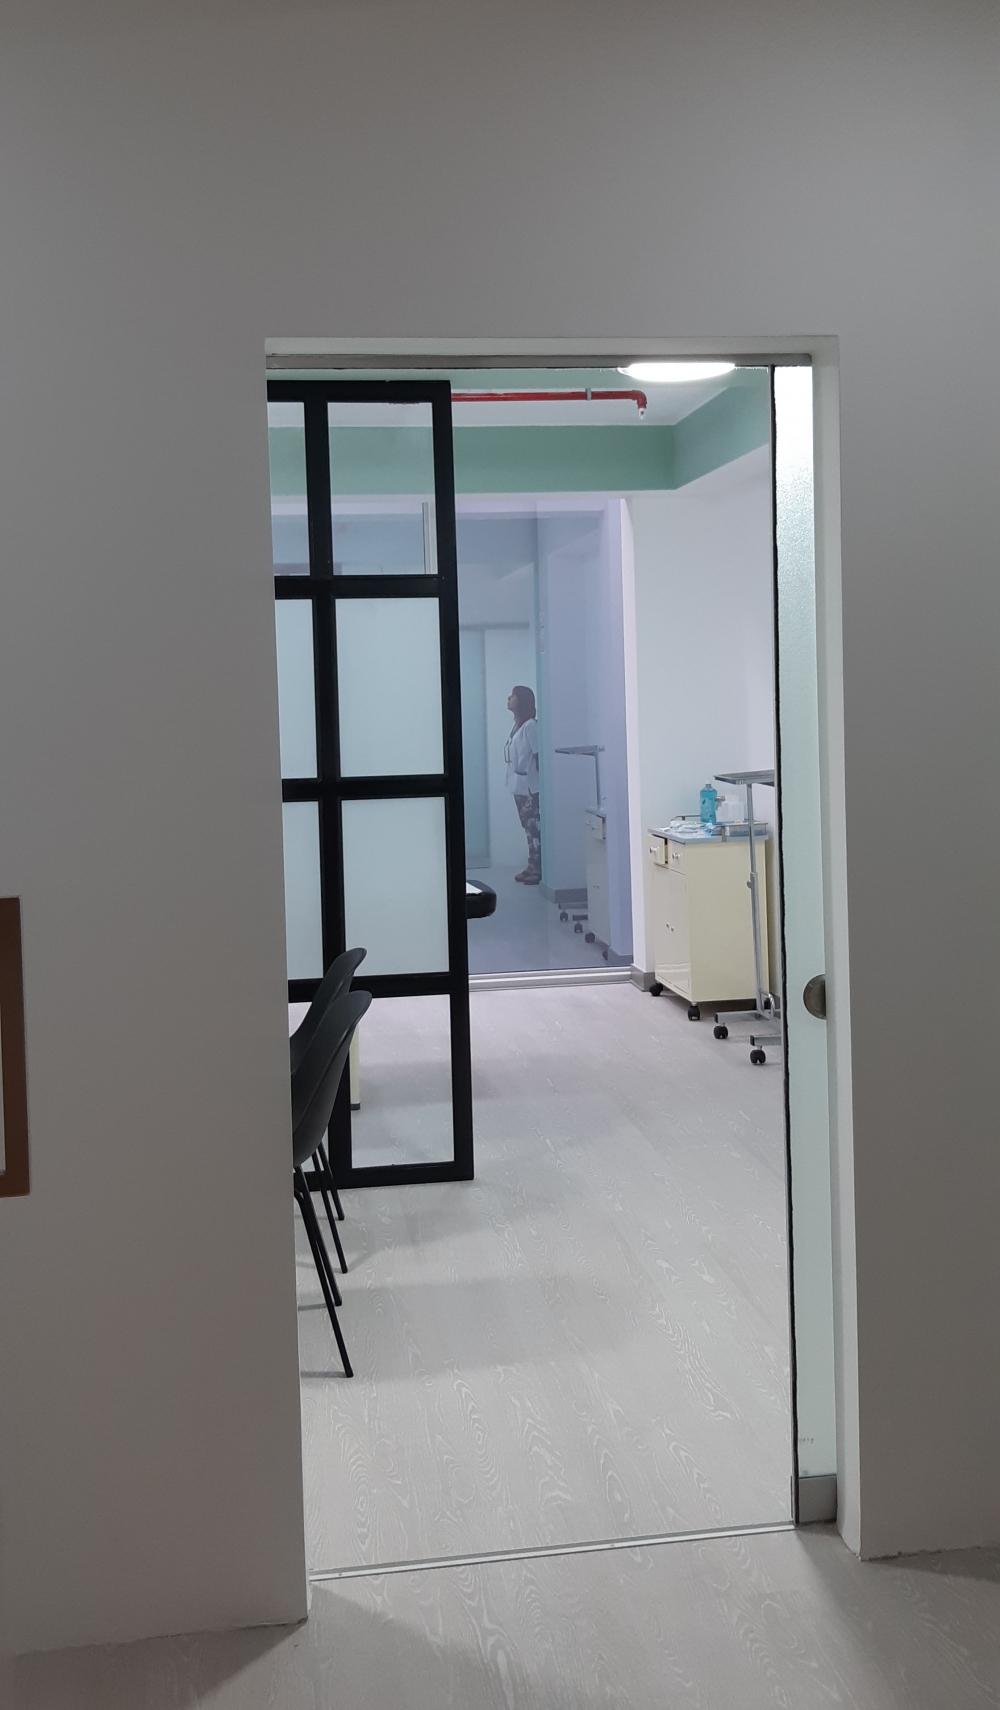 39-dr-esteban-lopez-elg-urologia